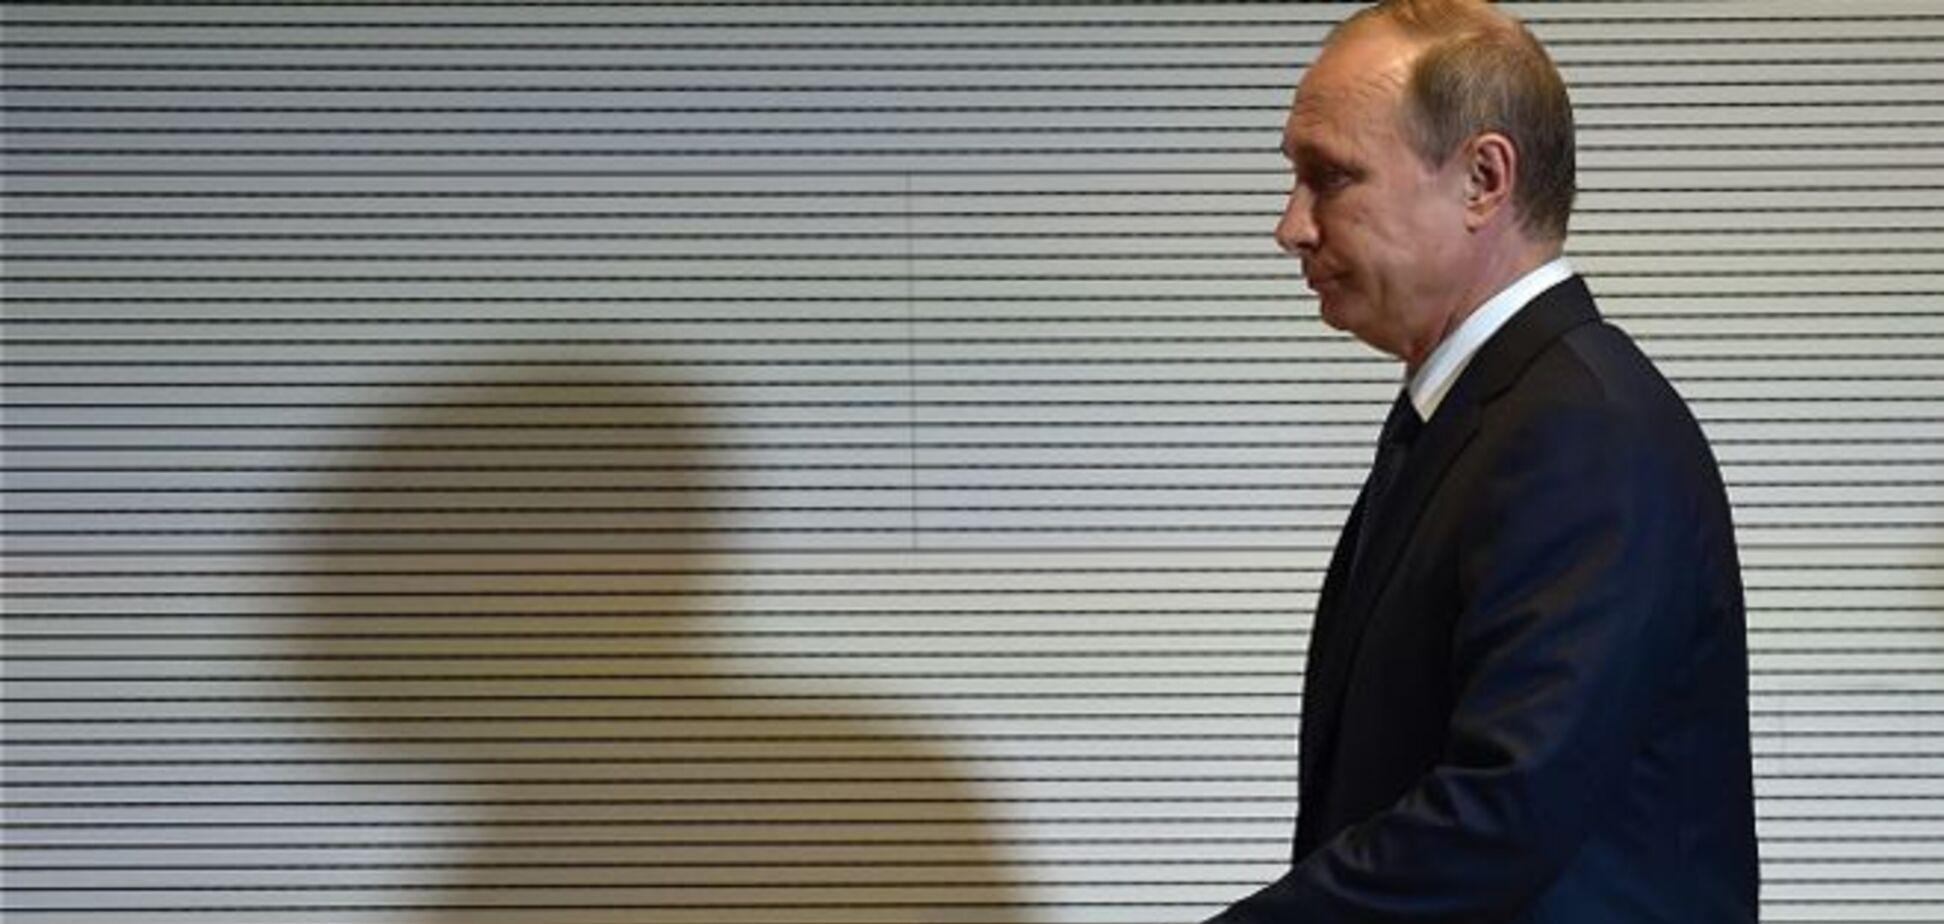 Владимир Путин. Источник: РБК